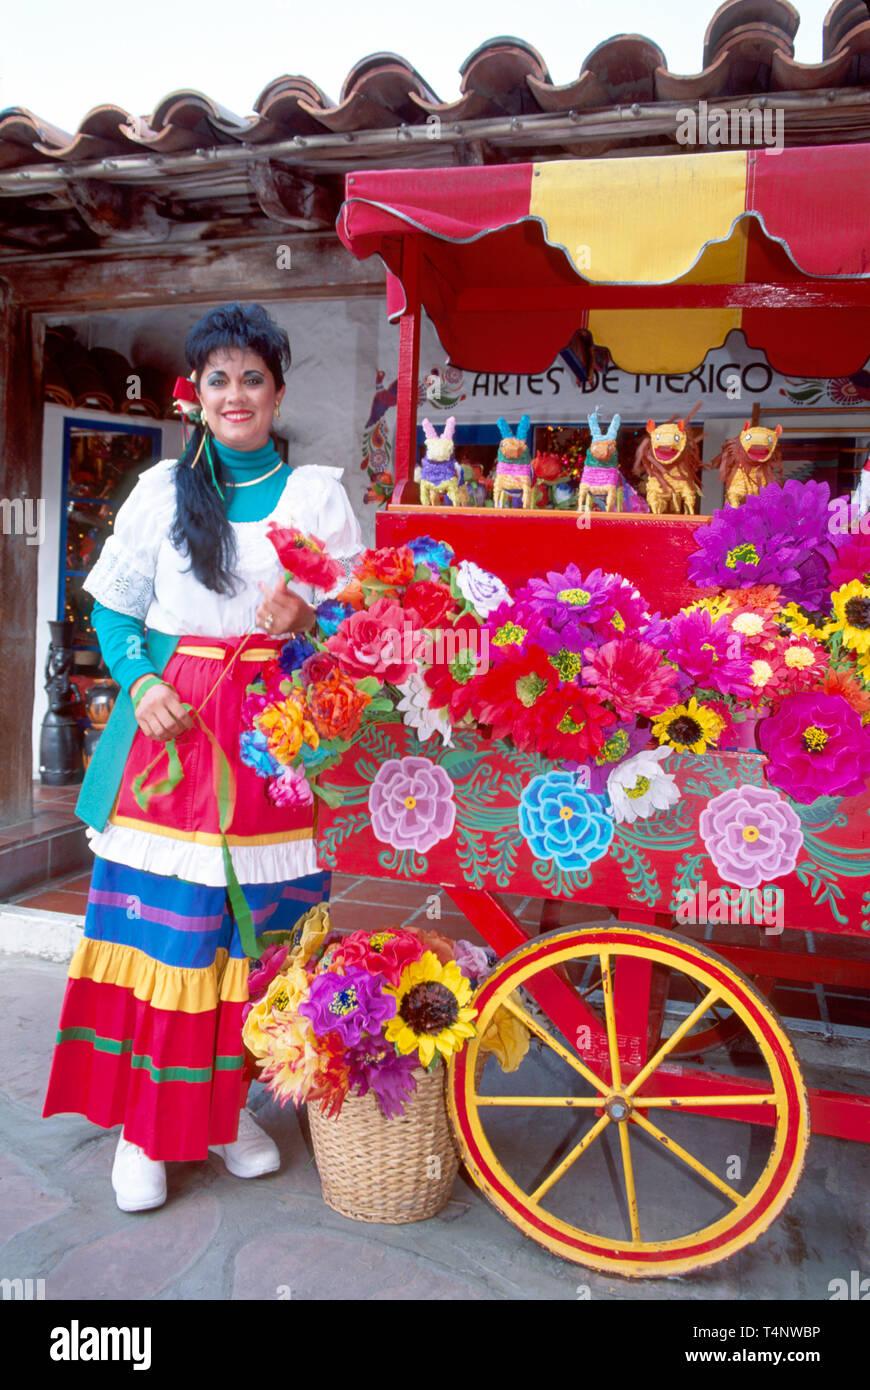 California San Diego Old Town Bazaar del Mundo Mexican woman paper flower kiosk - Stock Image